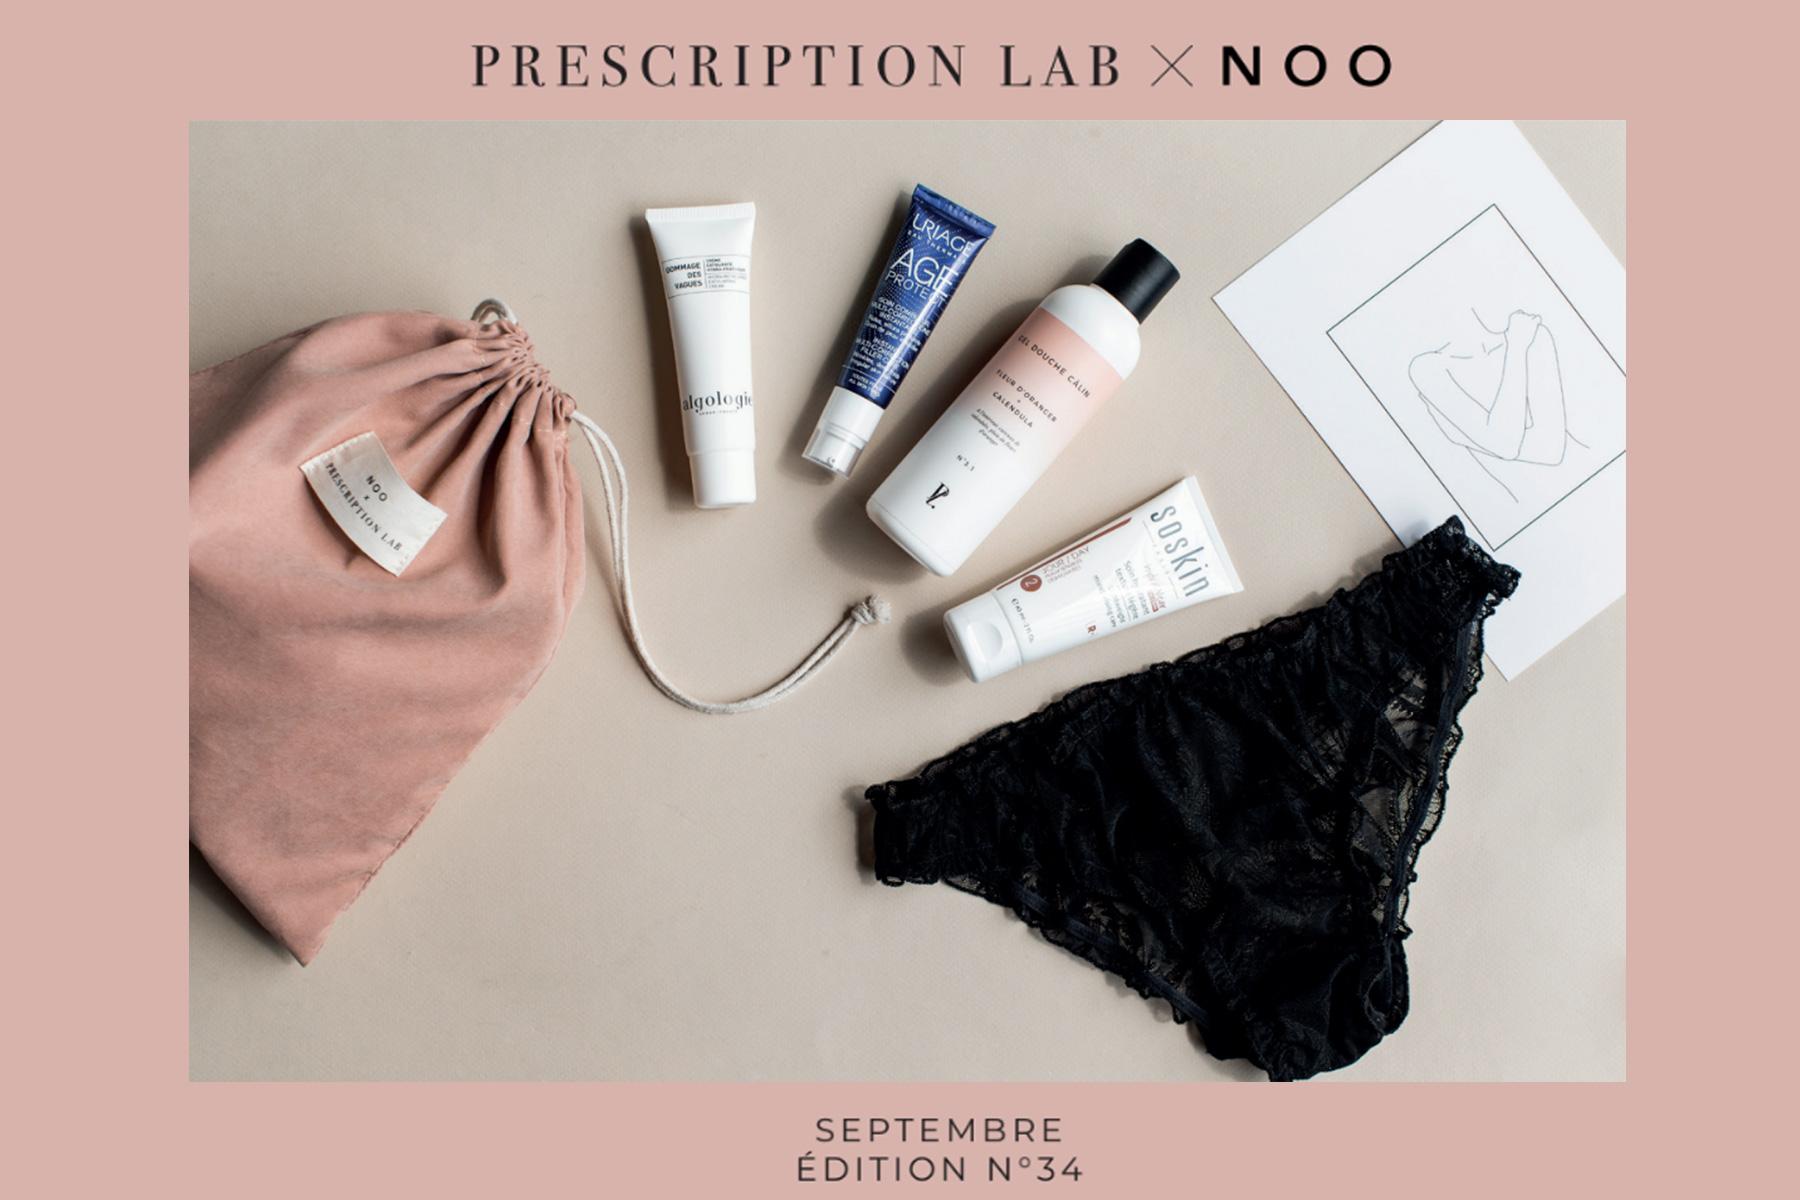 prescription-lab-septembre-2019